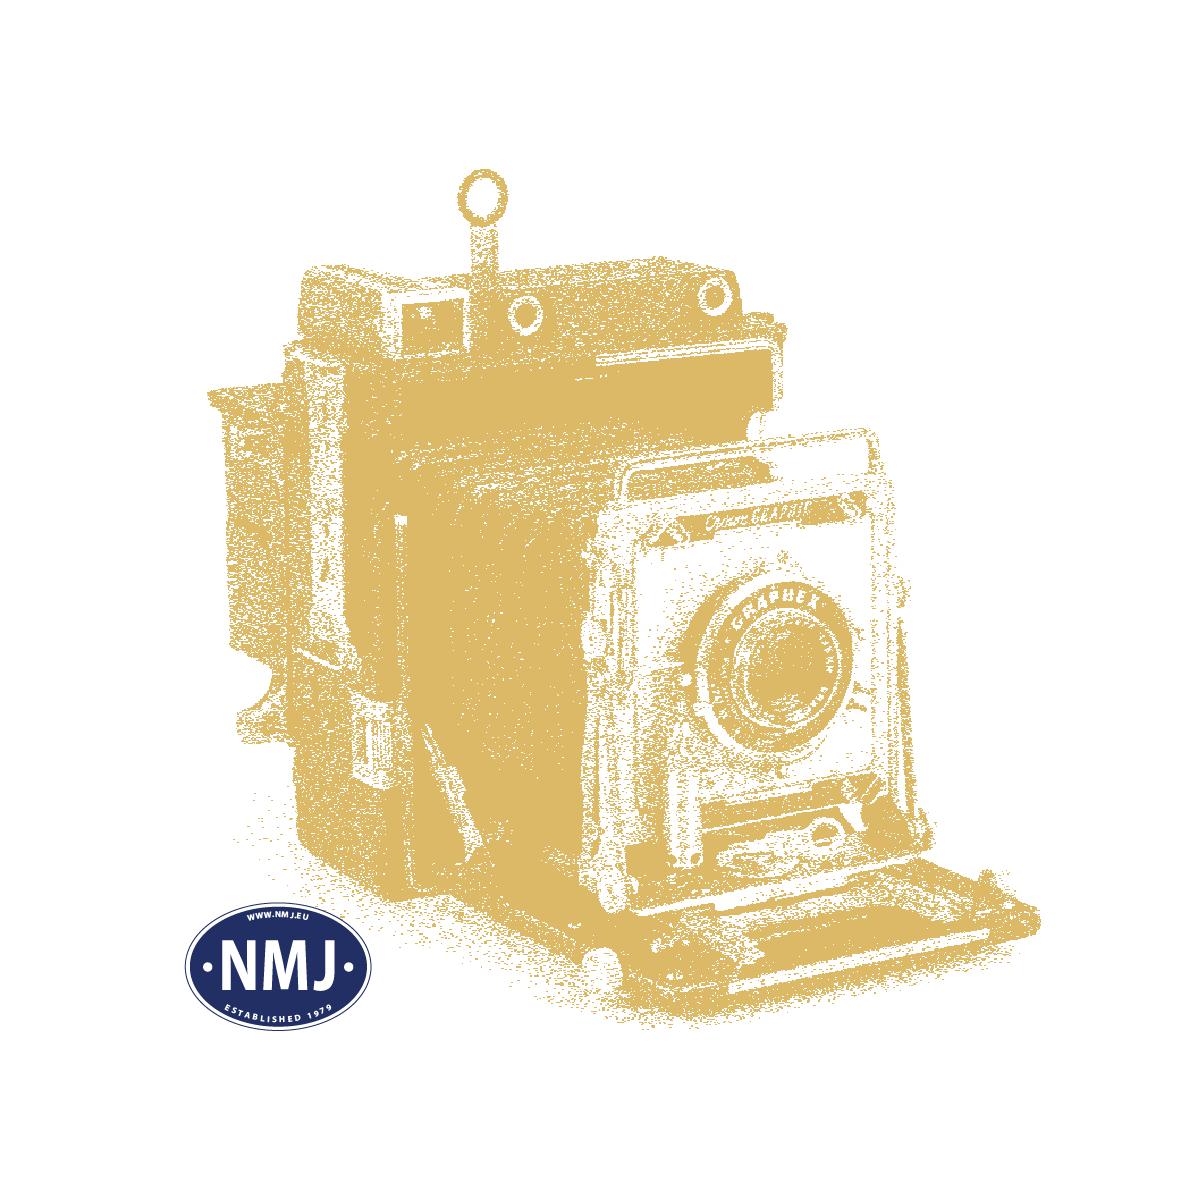 NMJT93004 - NMJ Topline SJ YF1 1331, Orange, DCC m/ Sound